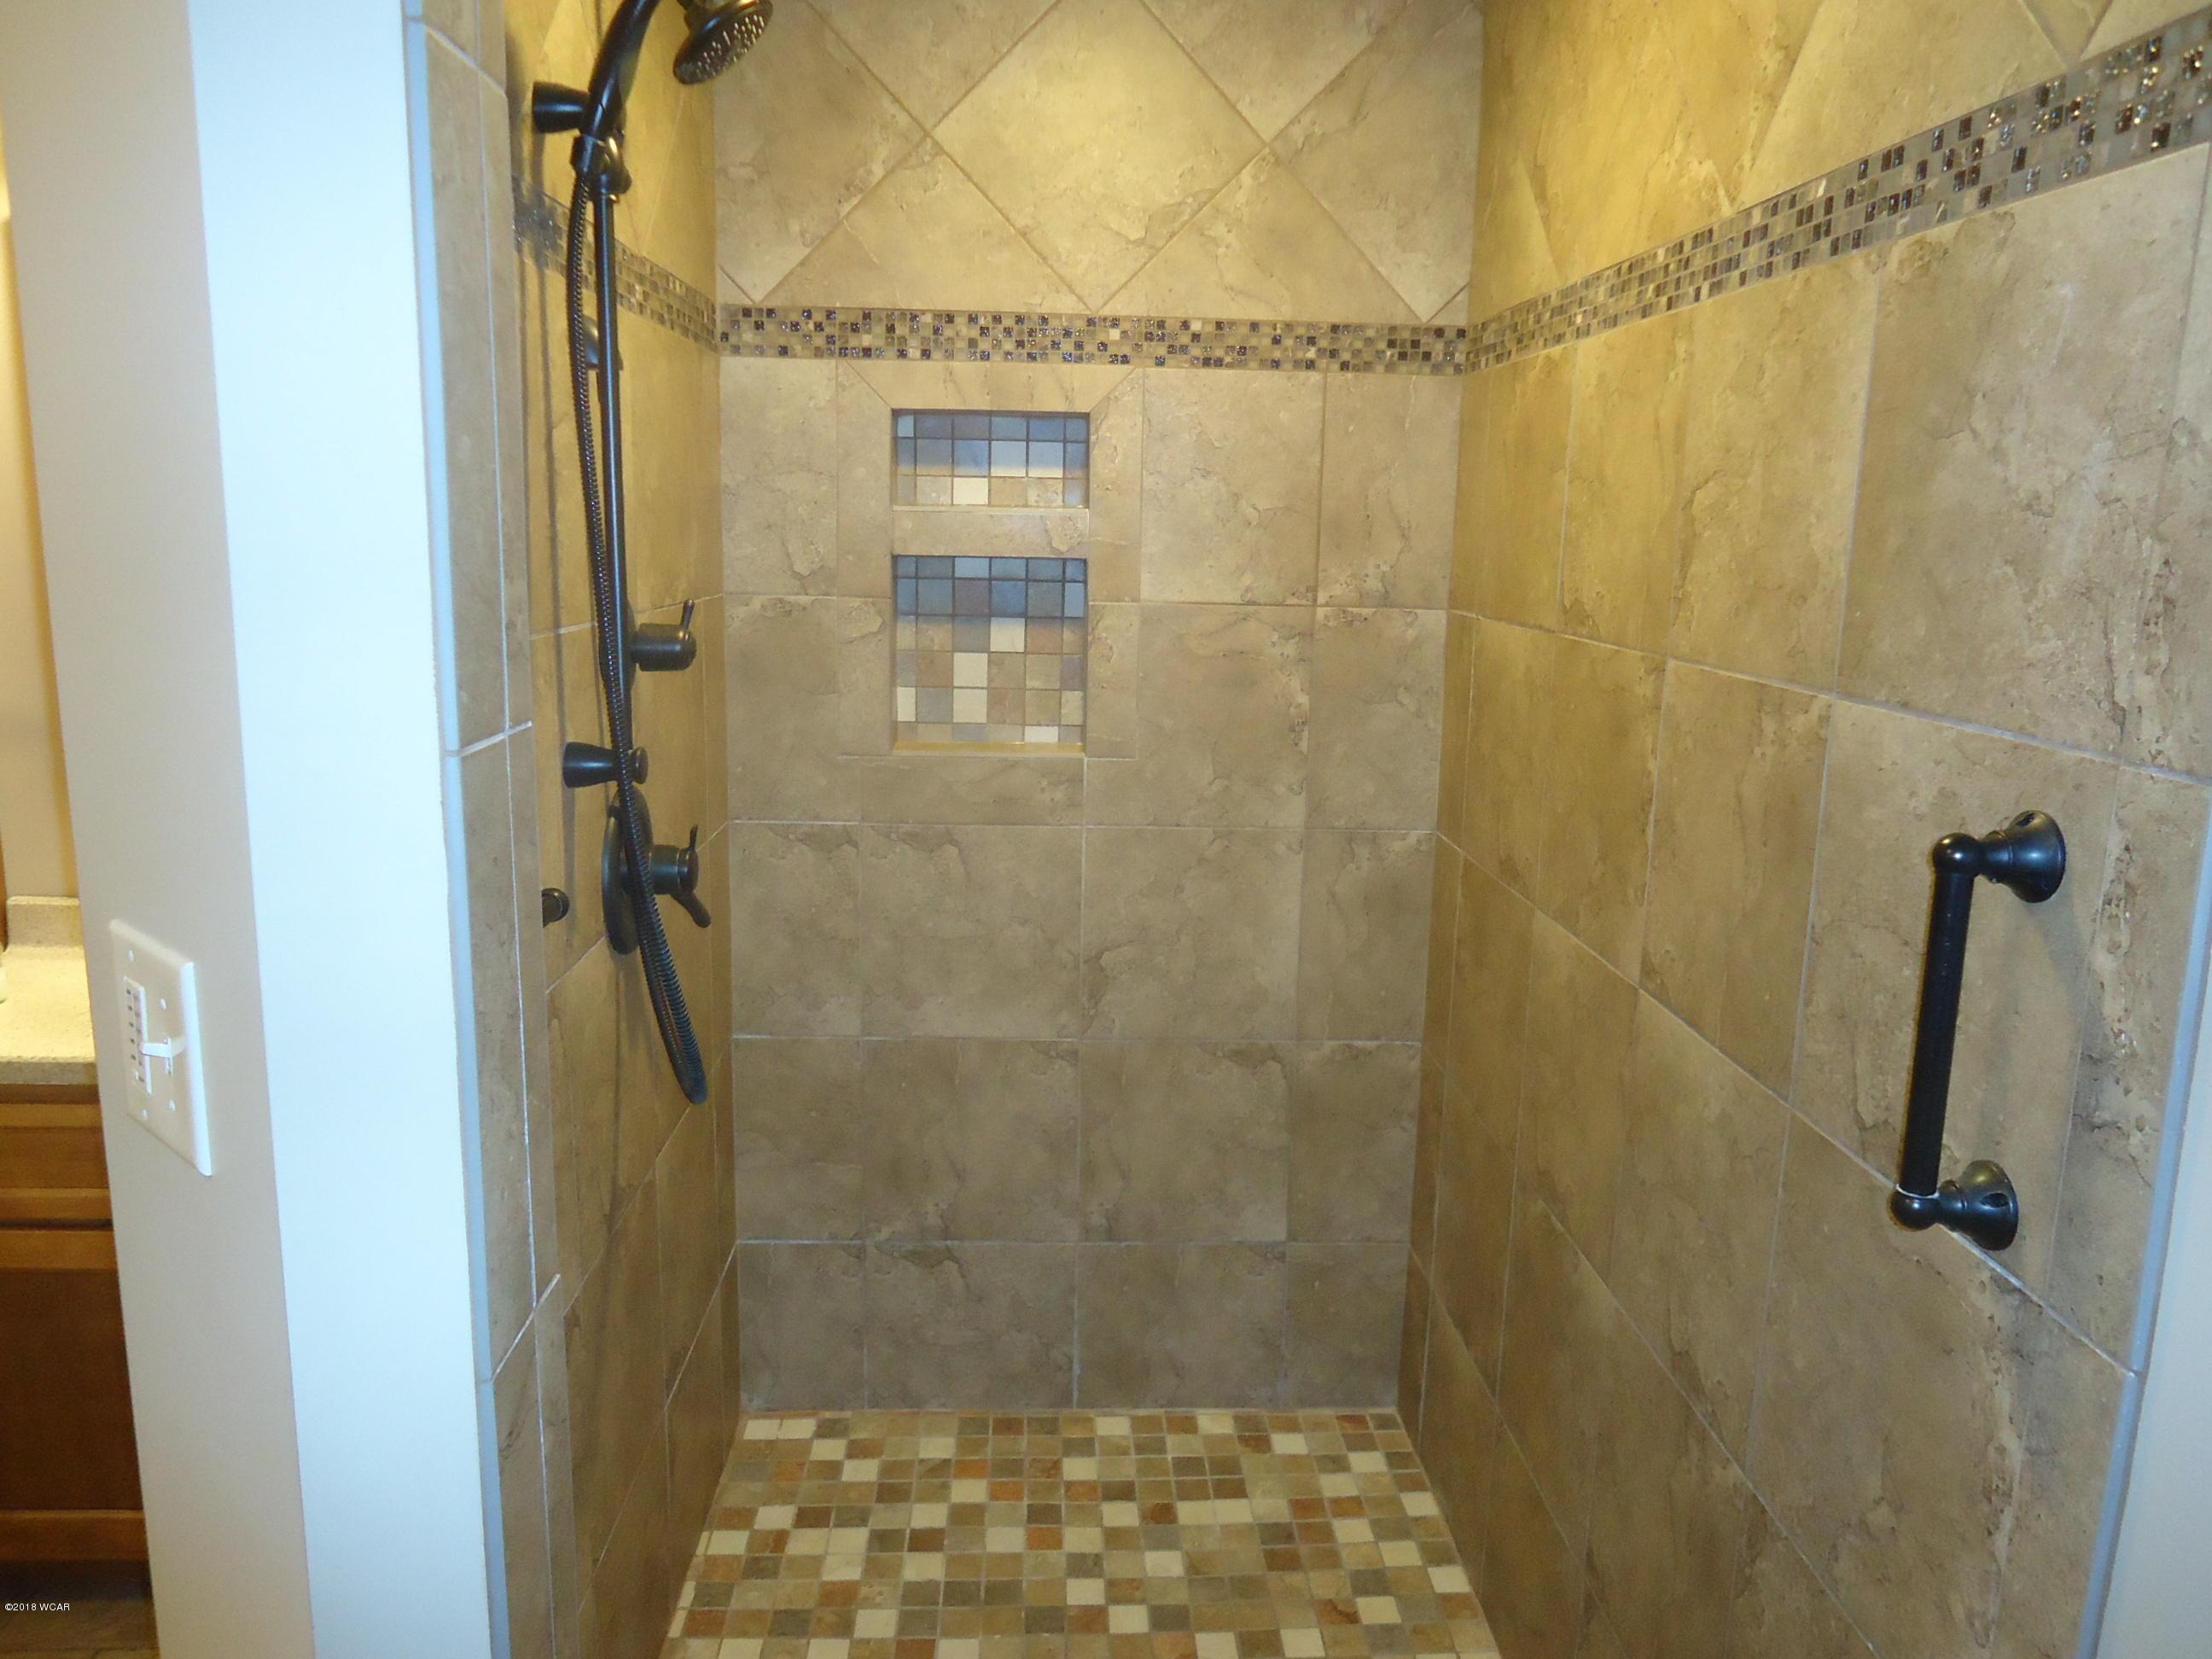 111 6th Street,Prinsburg,4 Bedrooms Bedrooms,2 BathroomsBathrooms,Single Family,6th Street,6032603